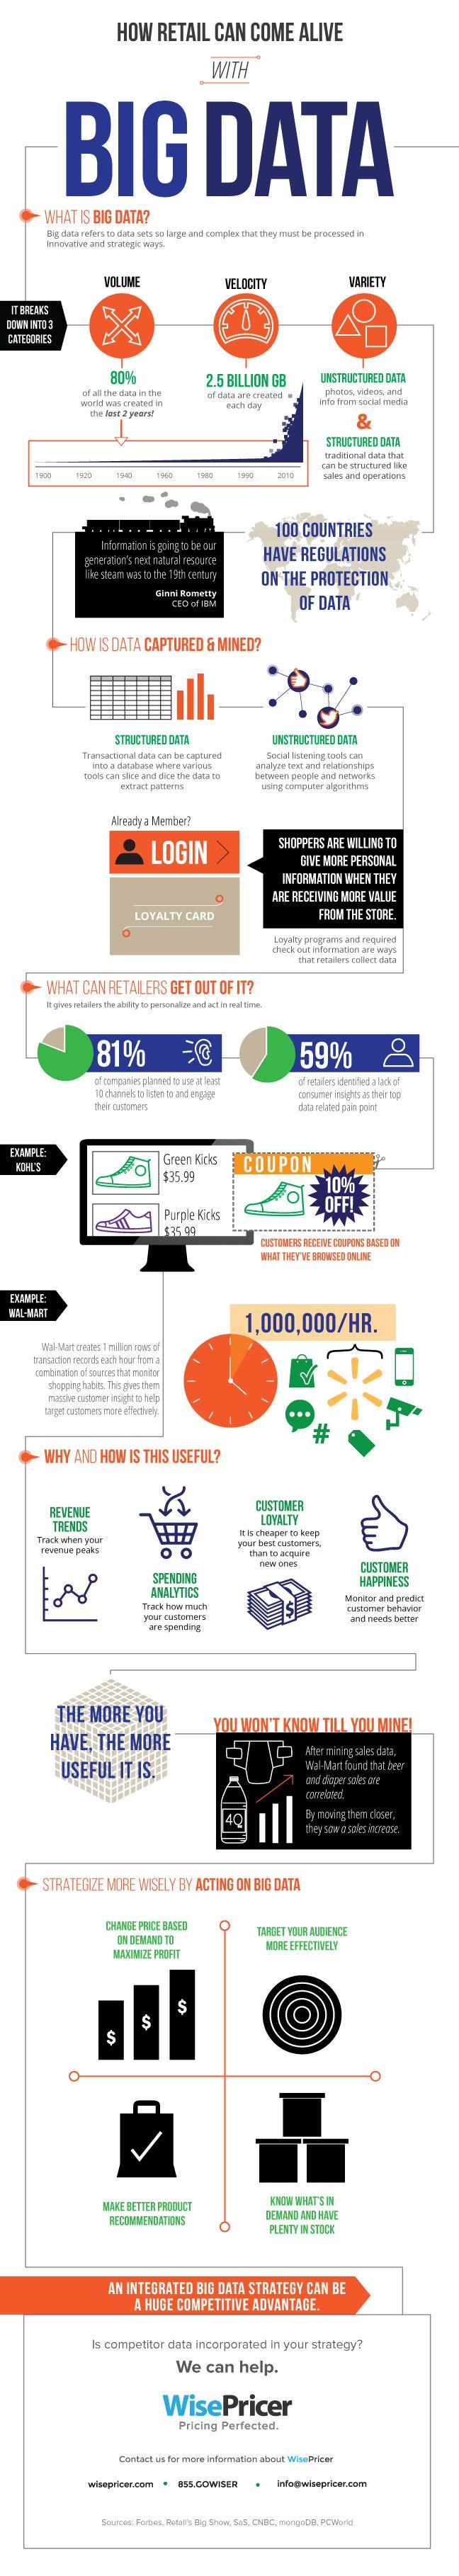 Benefits of using Big Data Analytics in Retail industry [infographic]